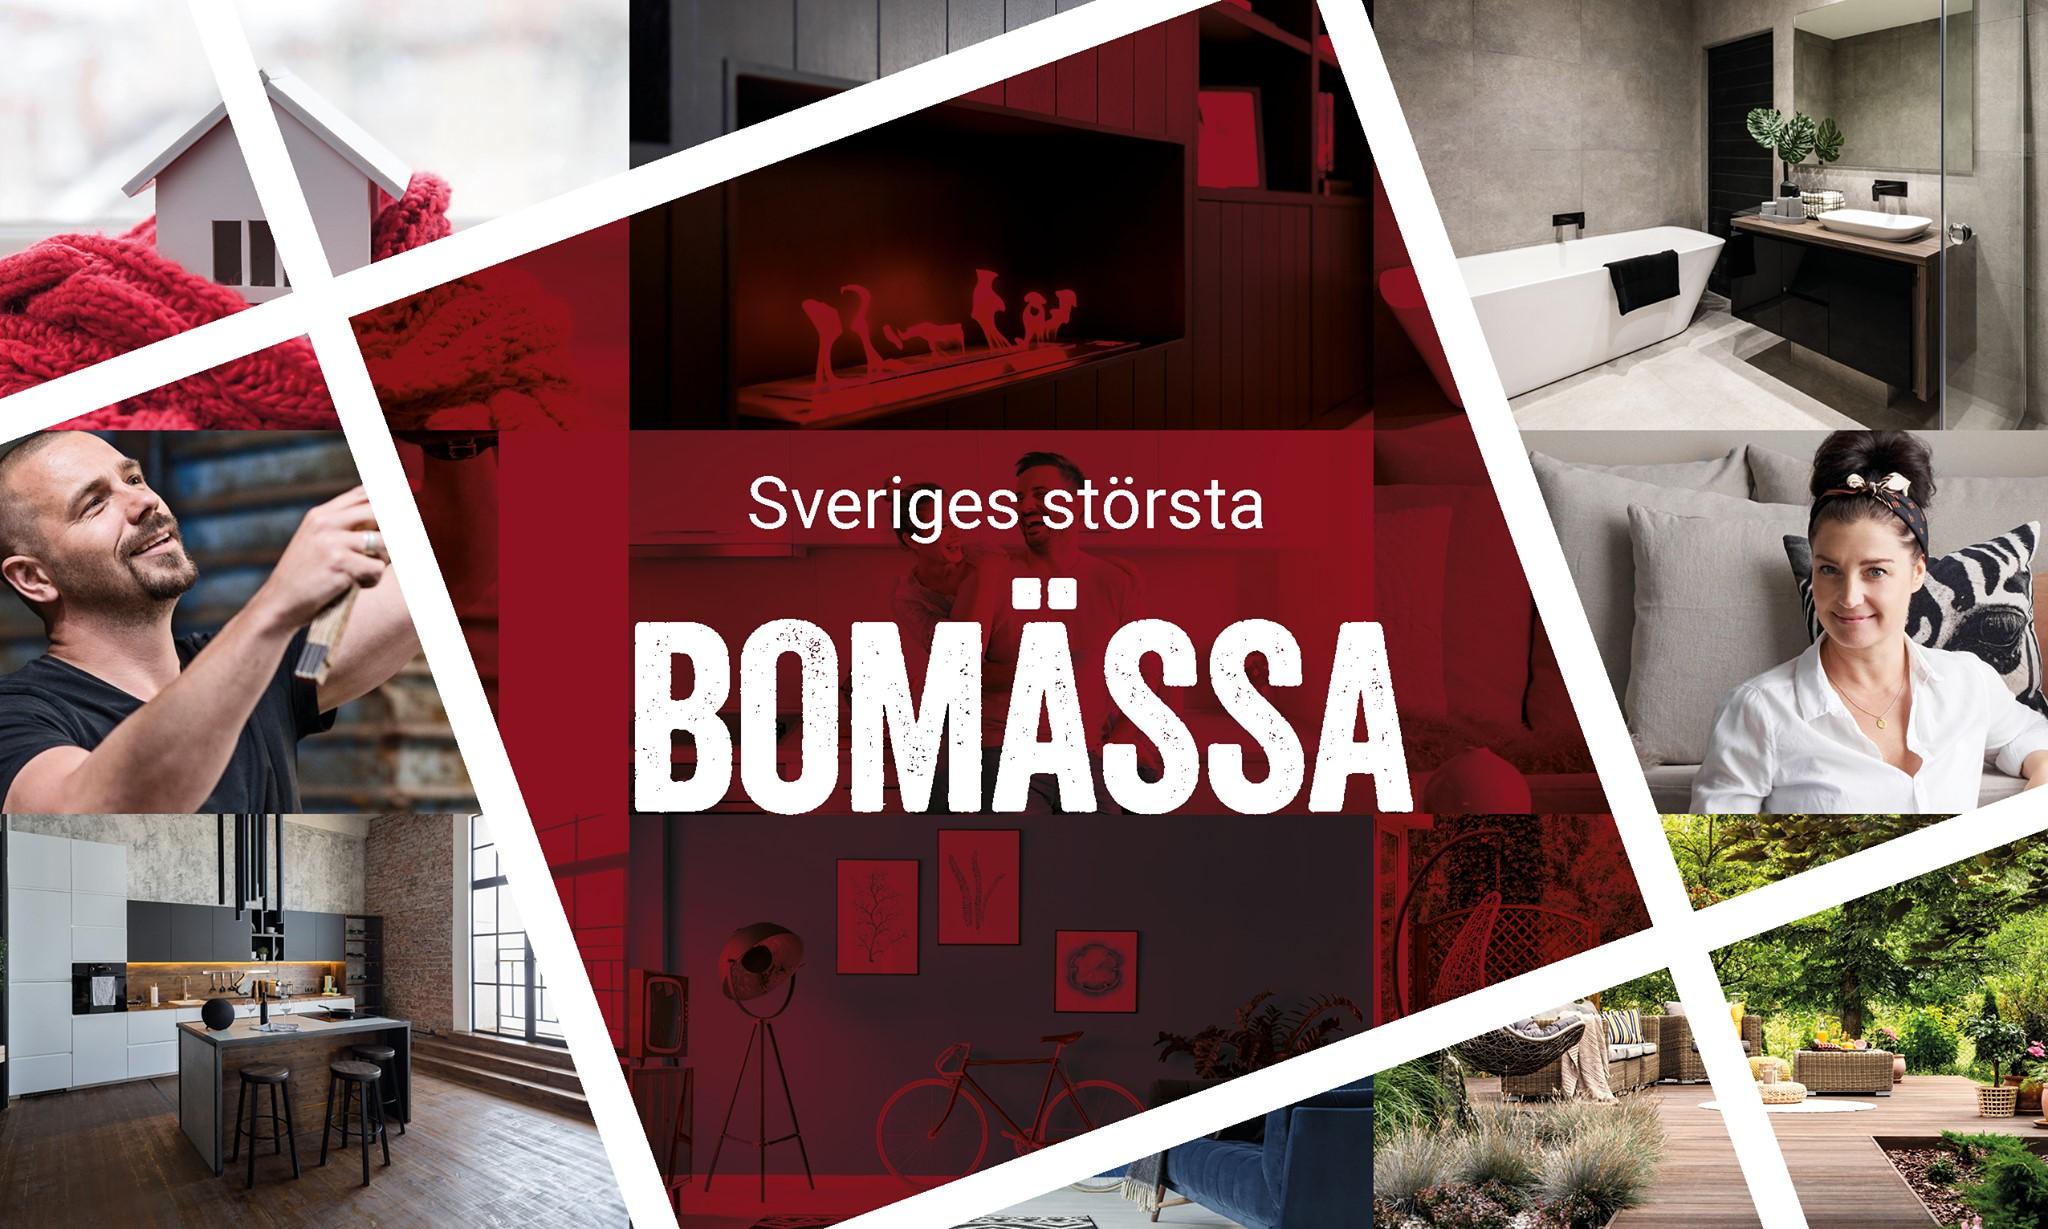 Sveriges största Bomässa